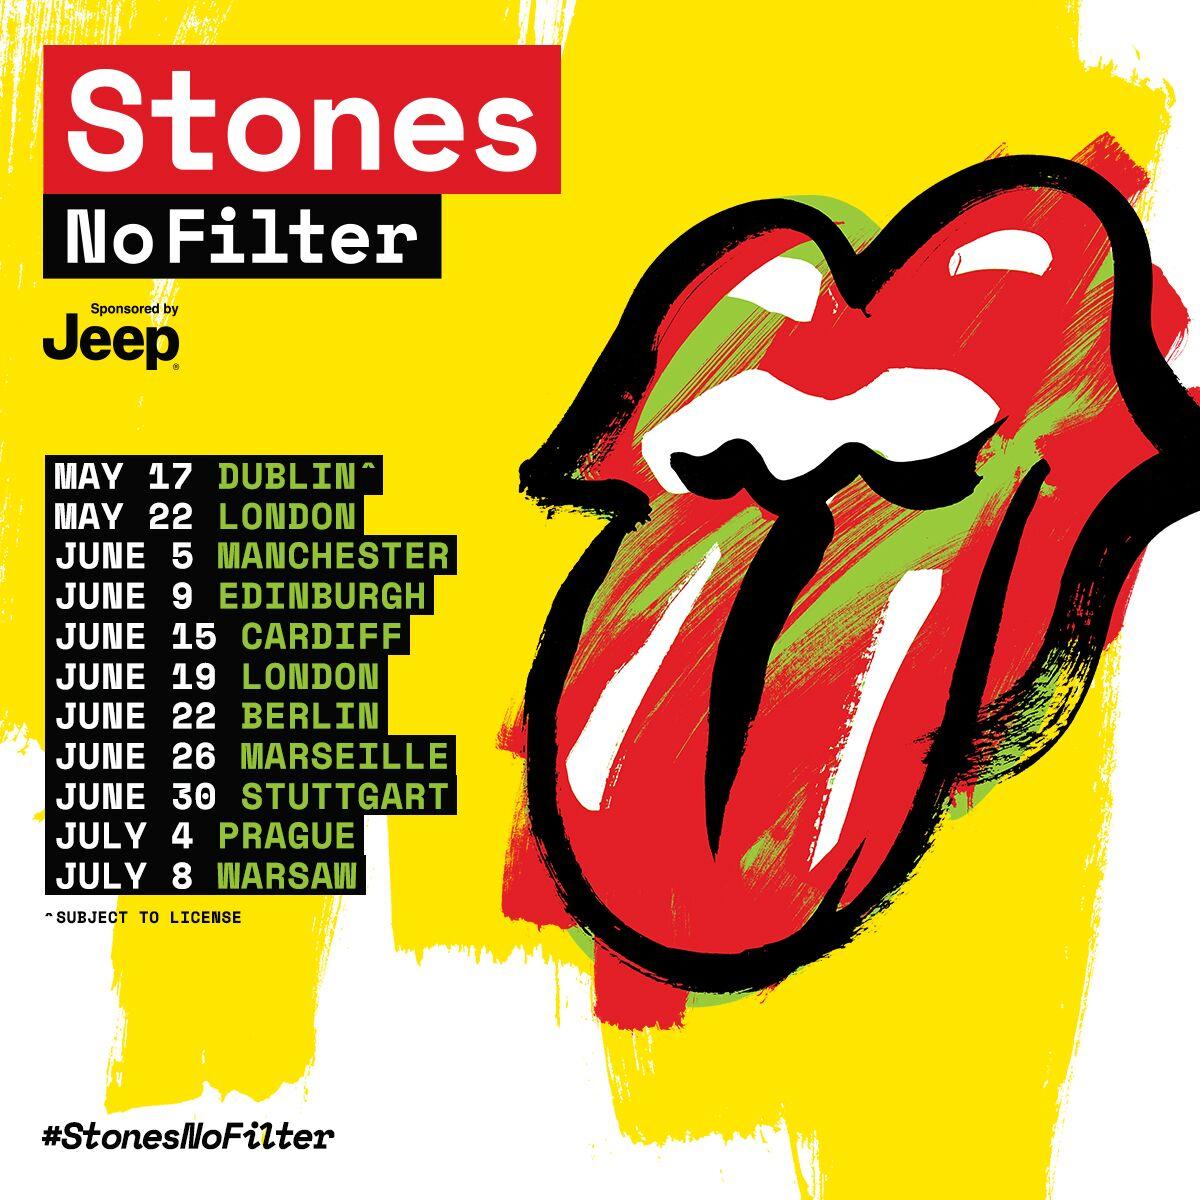 The Rolling Stones. - Página 19 DW8lEnbW0AE0S4V